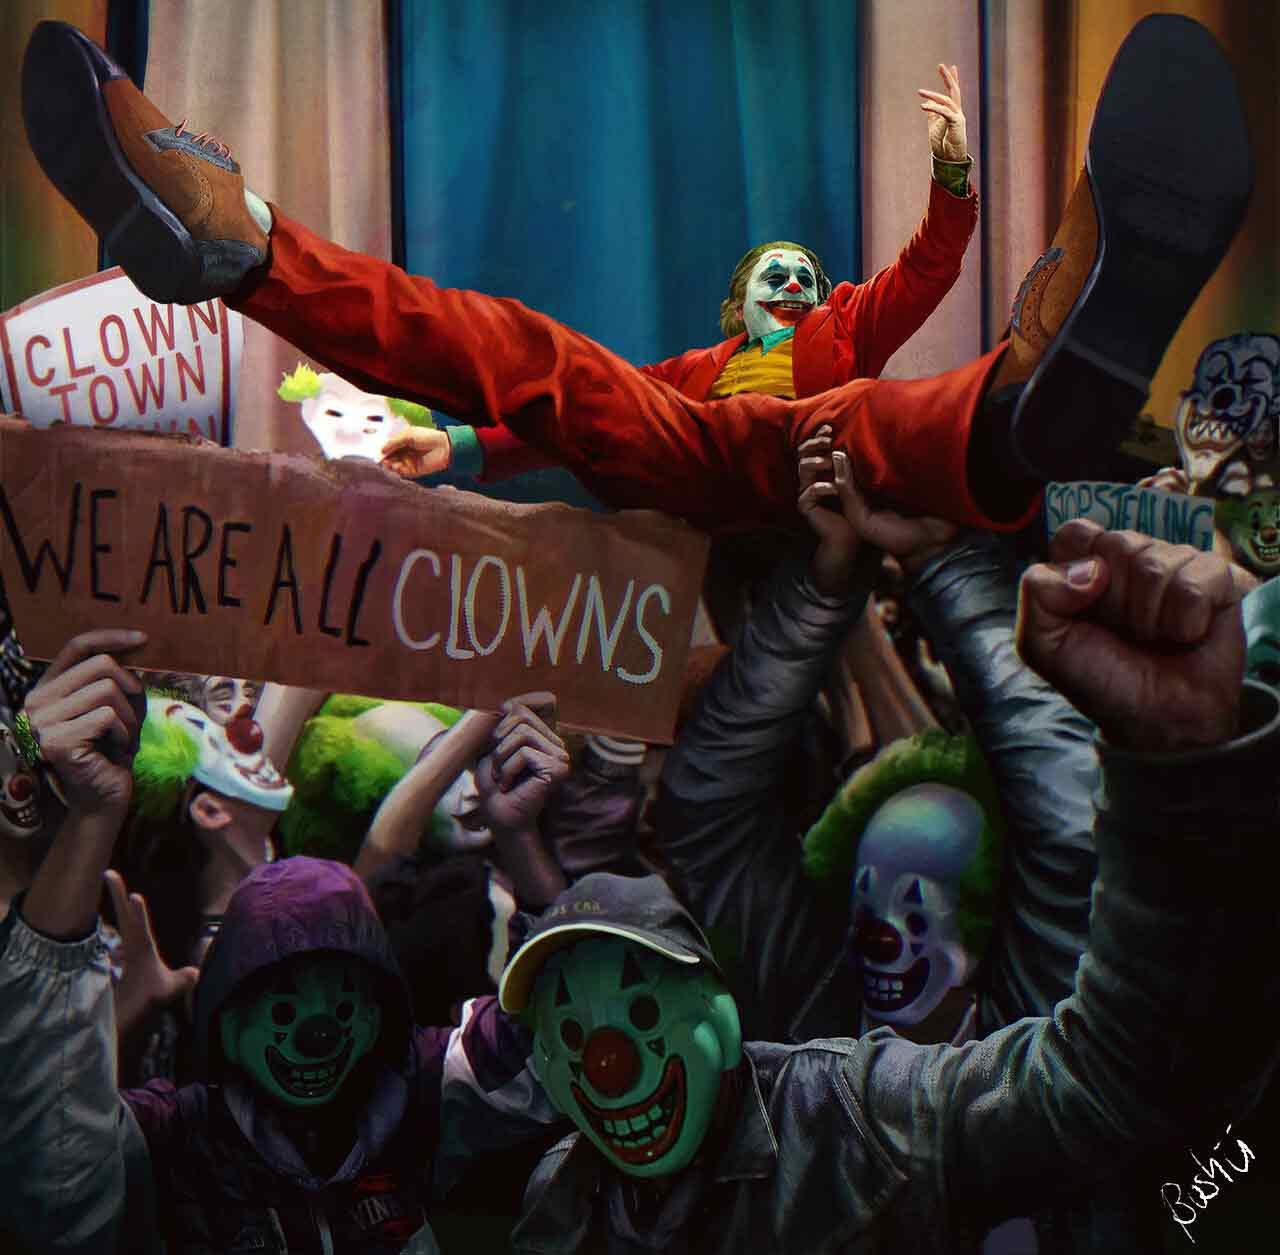 Joker es tomado como símbolo de protesta social.